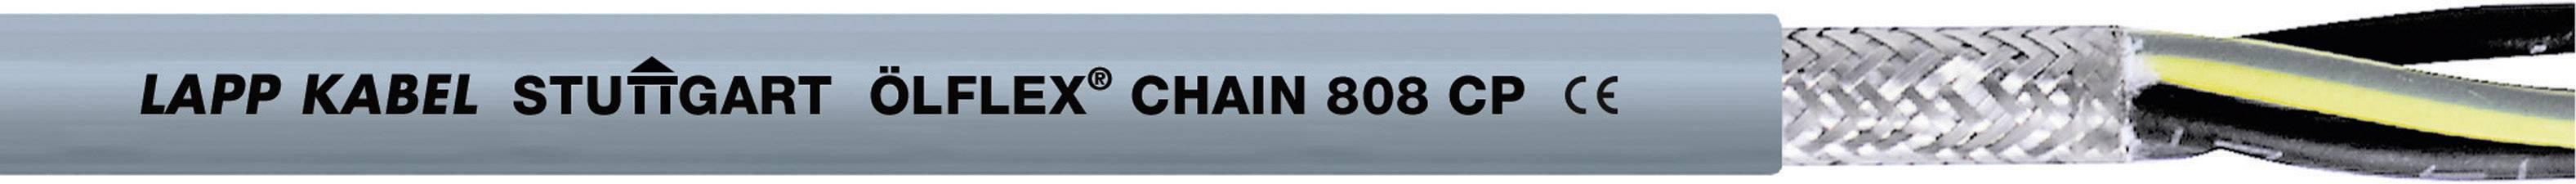 Žíla kabelu LappKabel ÖLFLEX CHAIN 808 CP 3G0,5 (1027752), 3x 0,5 mm², polyurethan, Ø 6,1 mm, stíněný, 100 m,